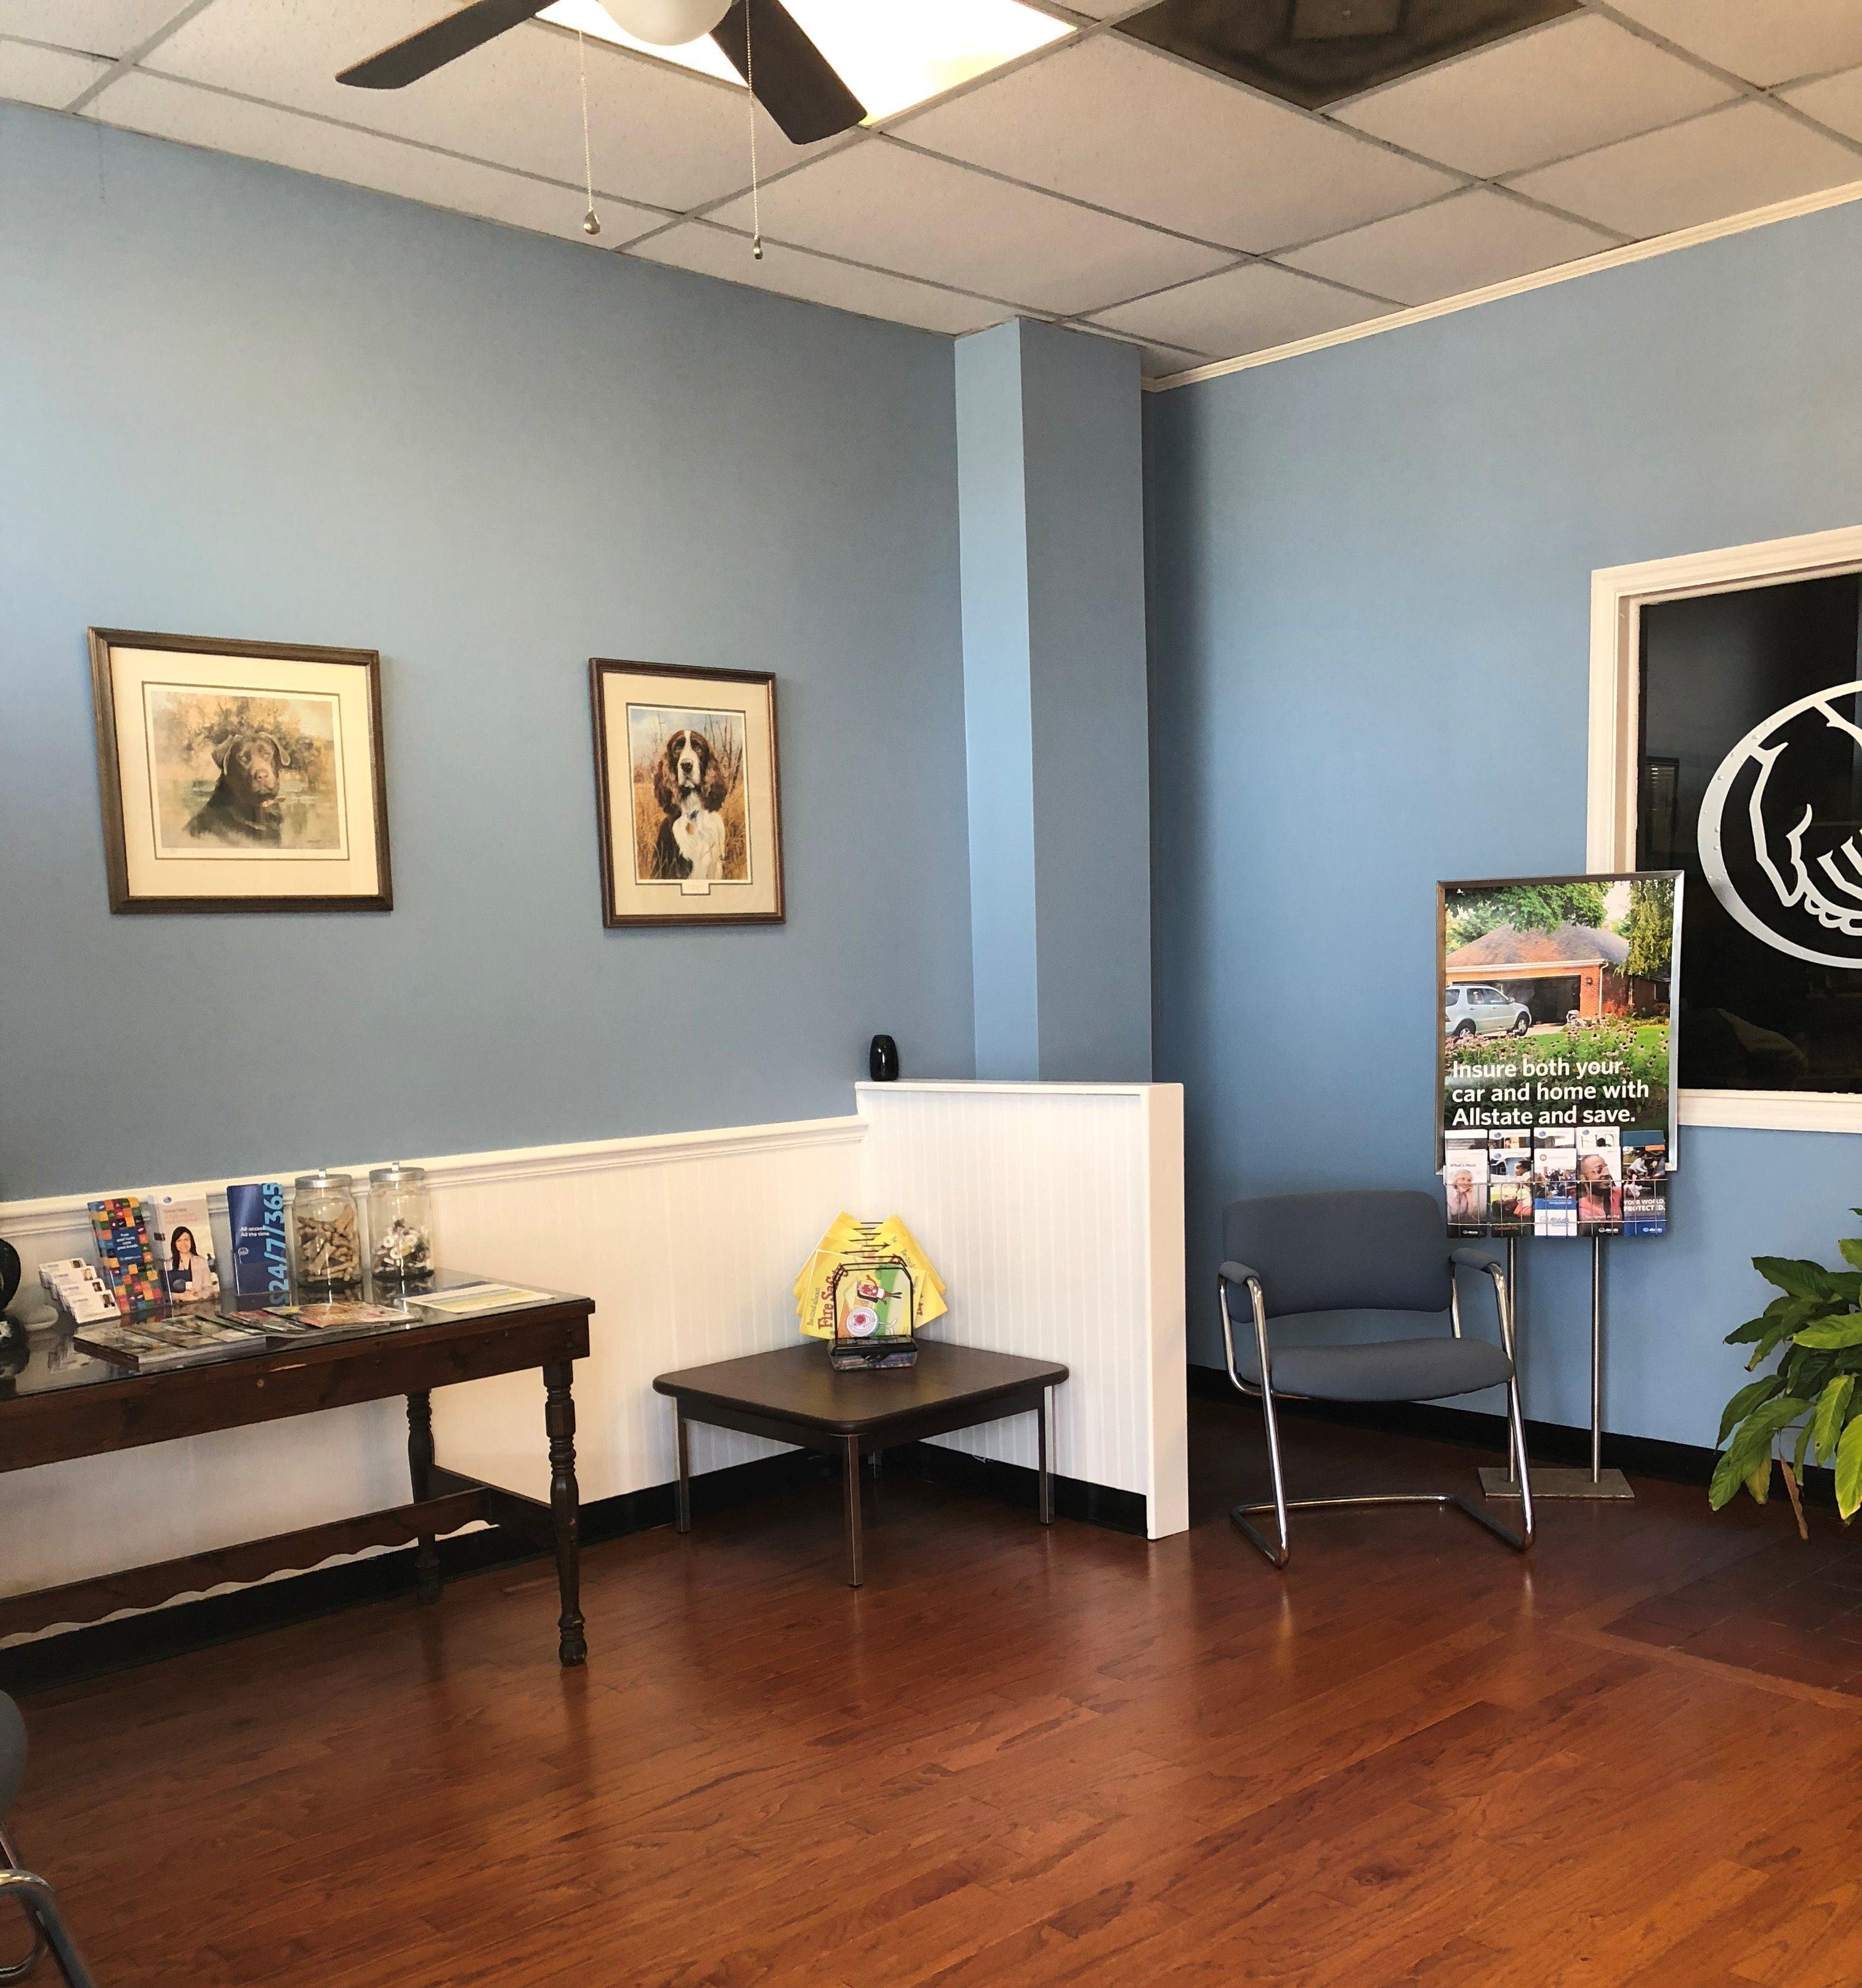 Joey Schooler: Allstate Insurance